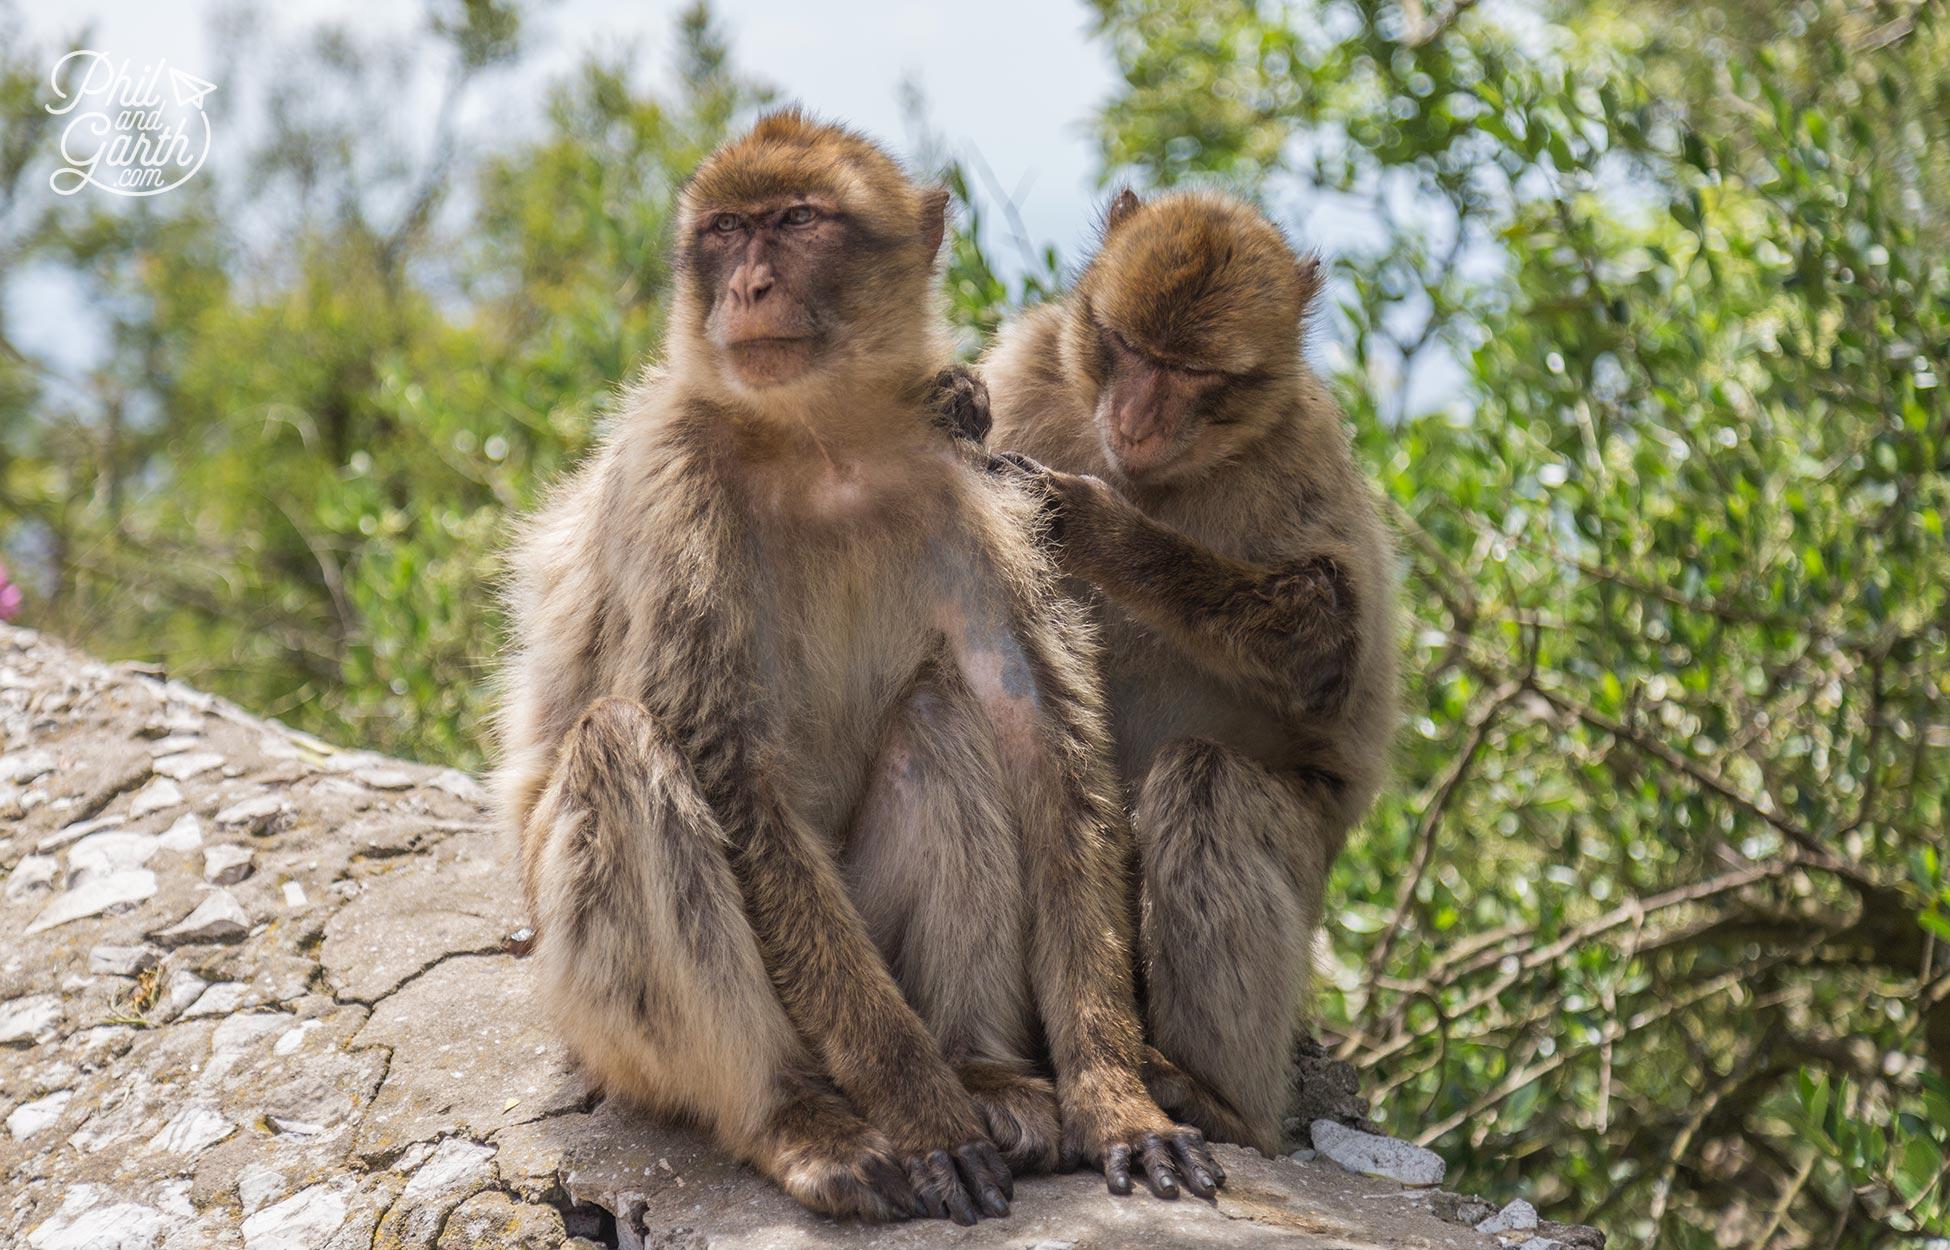 More apes at the Upper Apes Den